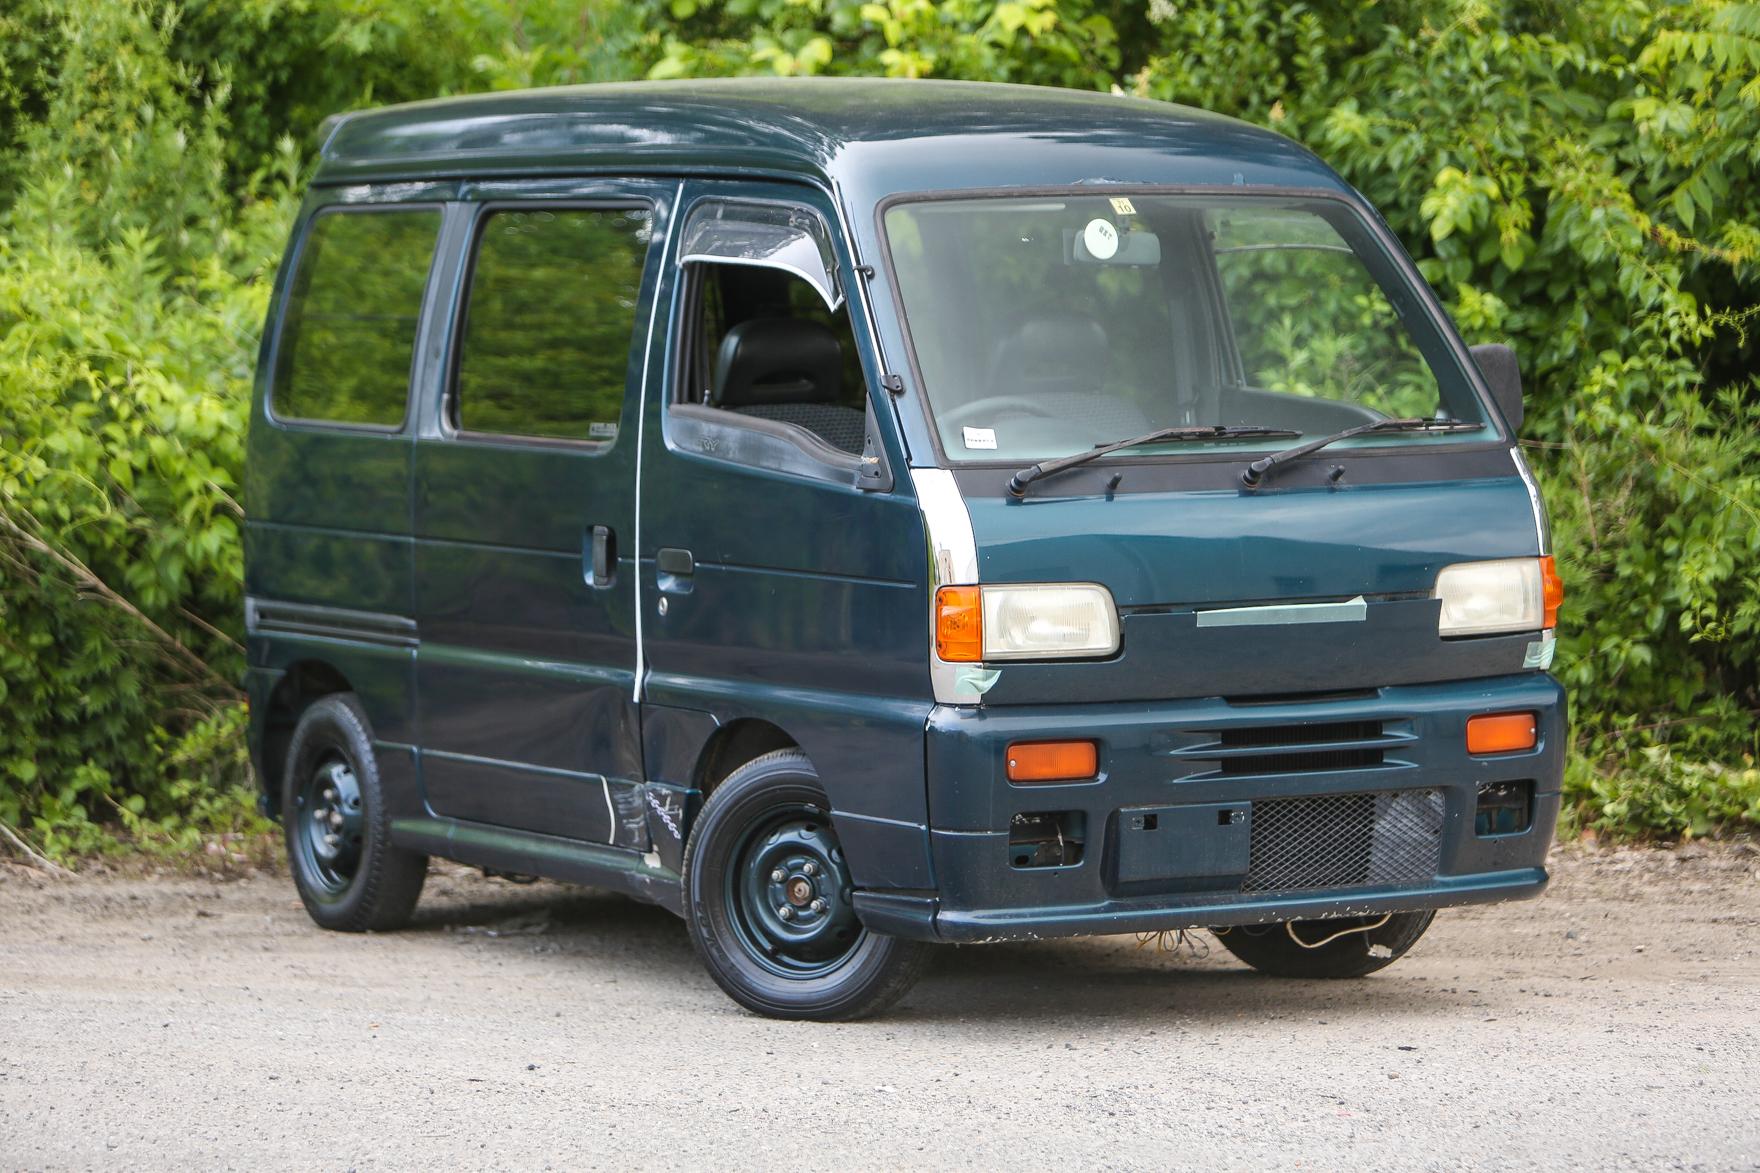 1995 Suzuki Every Joy Pop Turbo - Asking $7,950